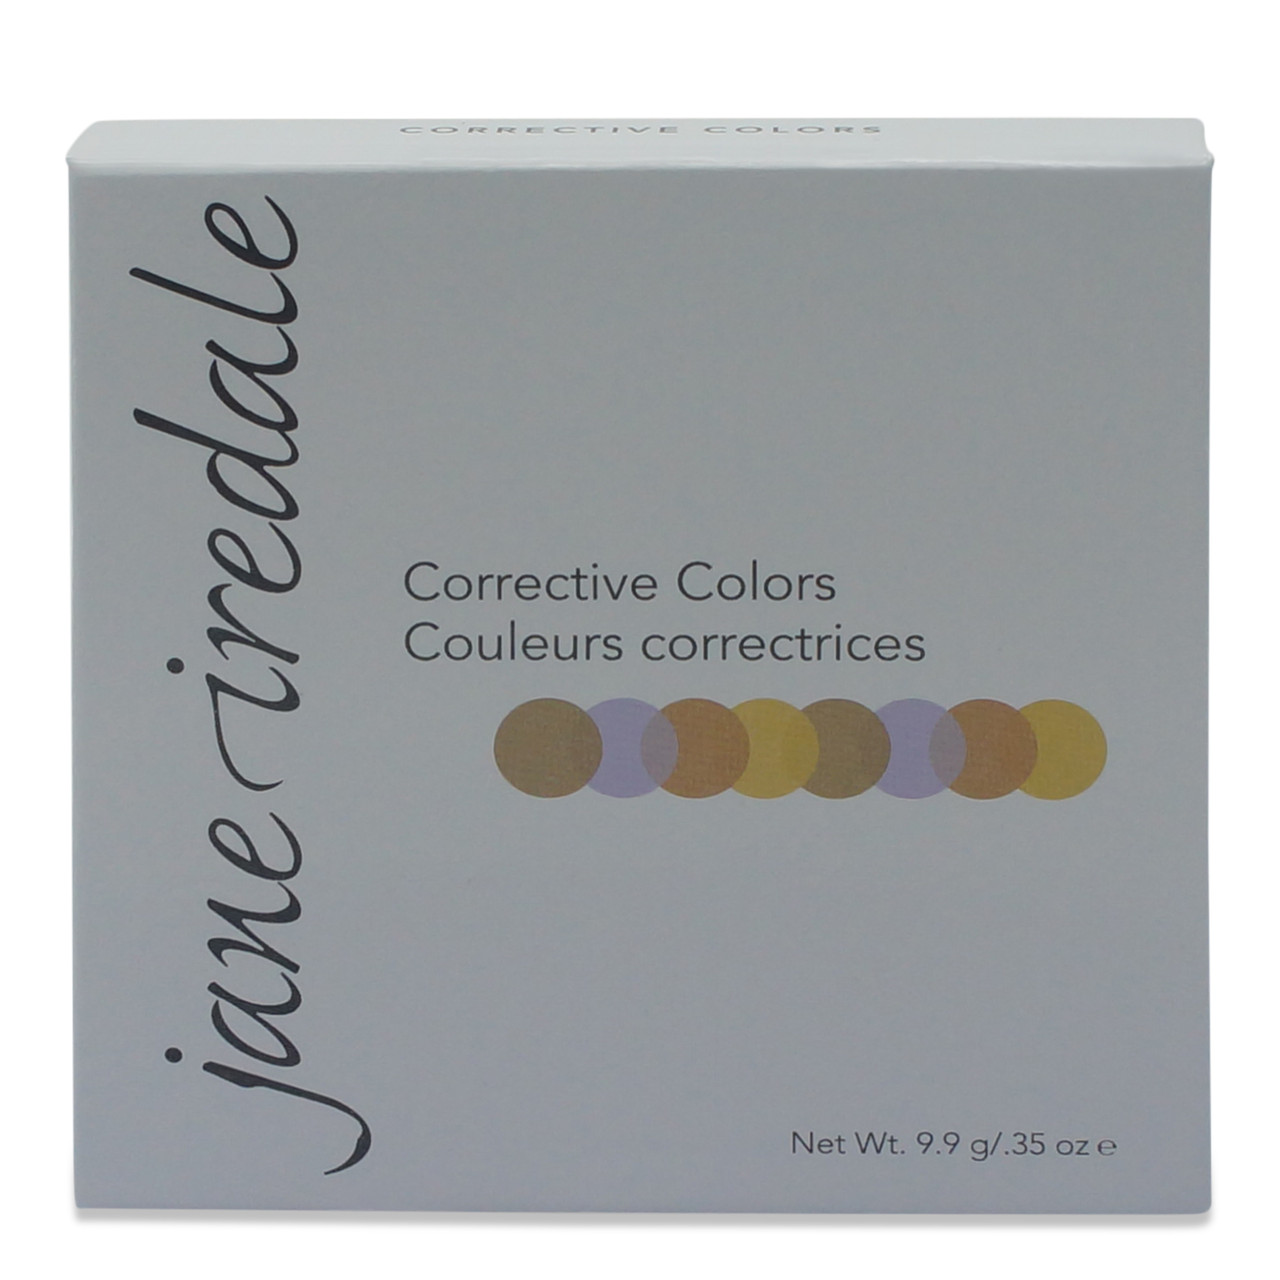 Corrective Colors